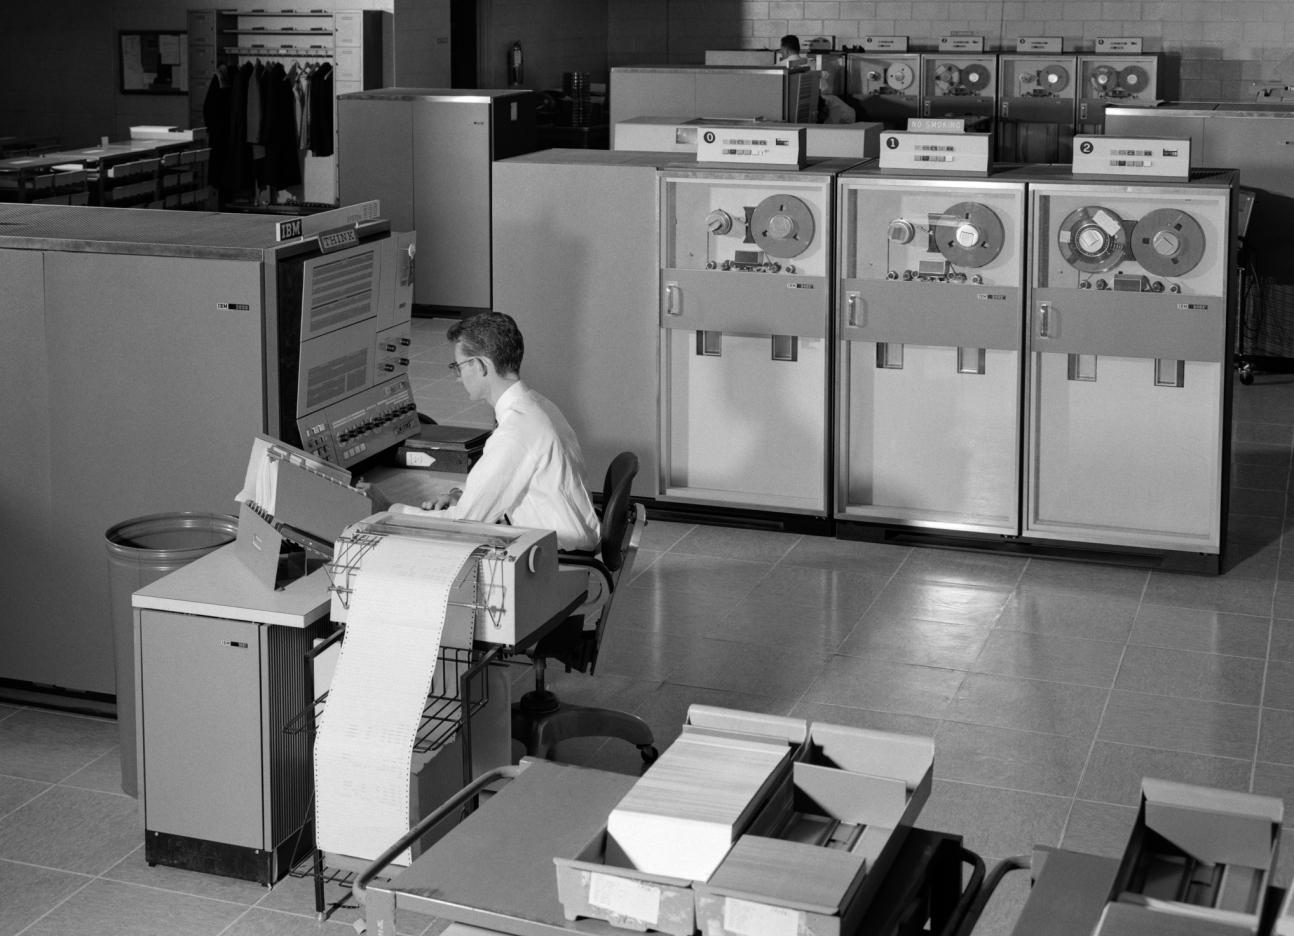 LZLabs 推出移动主机 COBOL 代码到 Linux 云的产品-芊雅企服